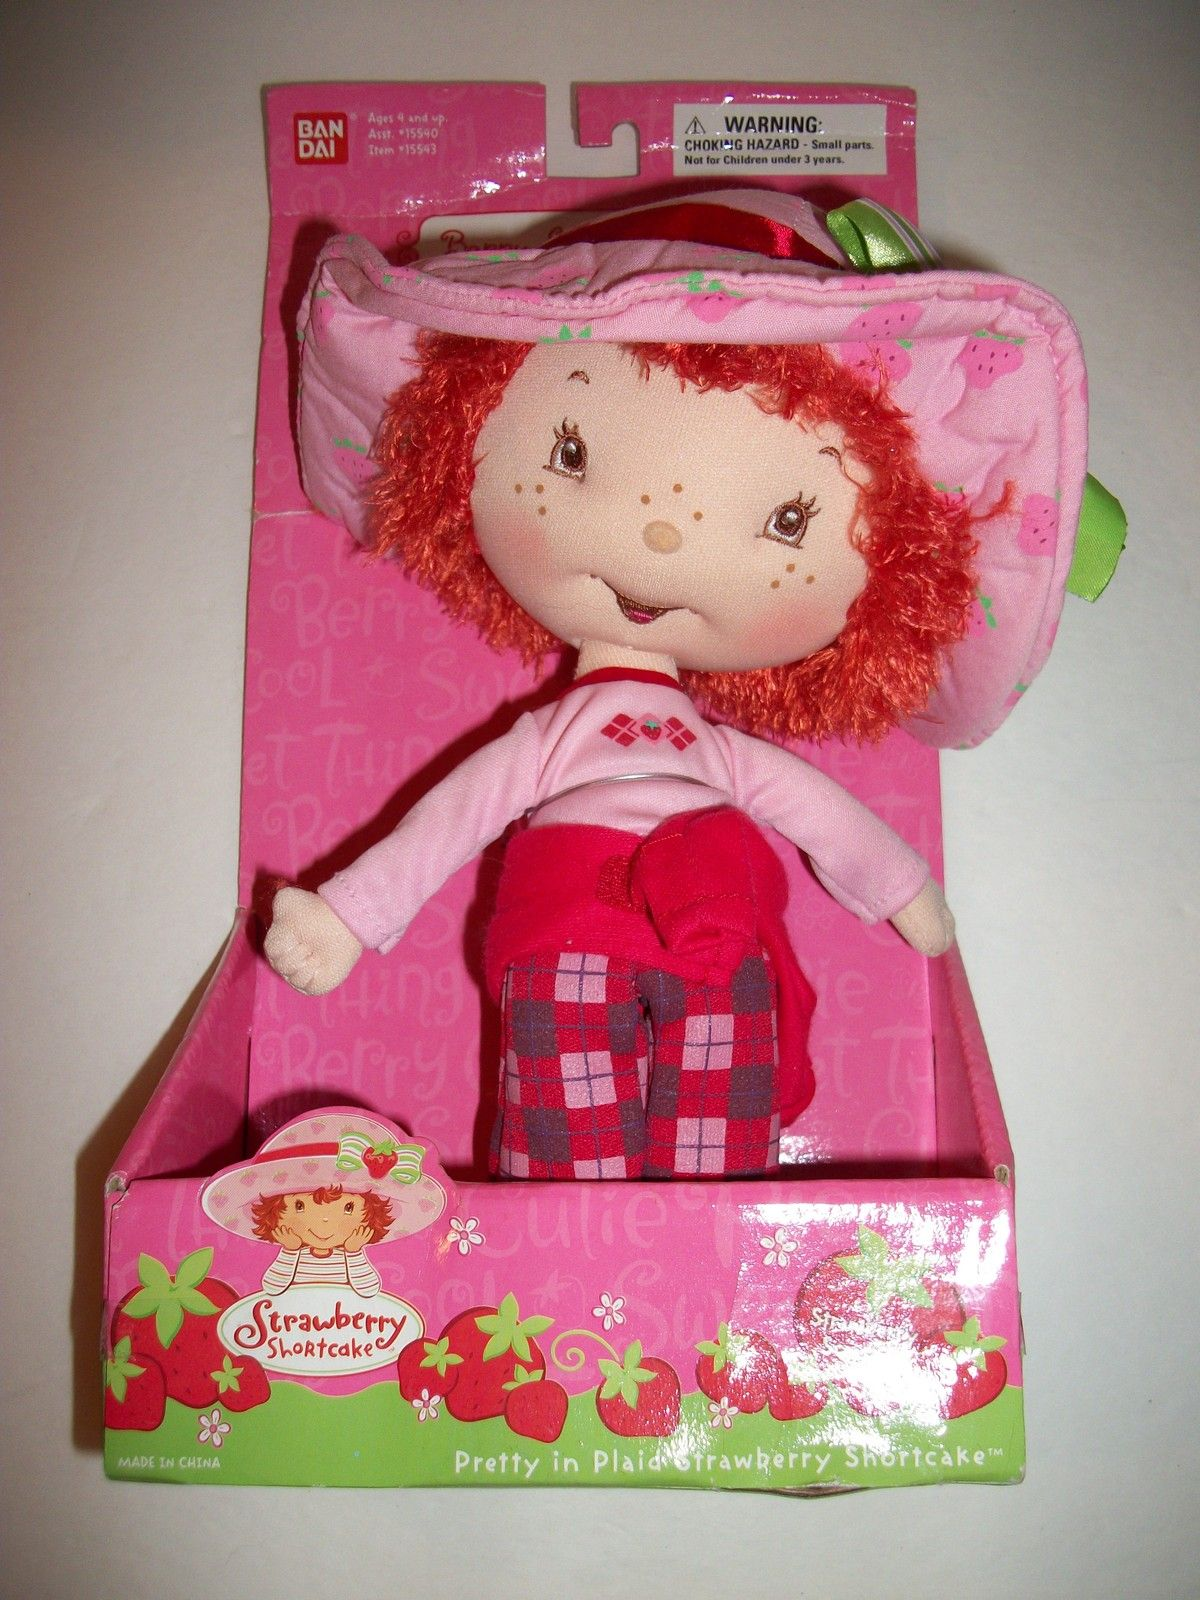 Strawberry Shortcake Doll In Plaid by Bandi | # 4. etc.... | Pinterest